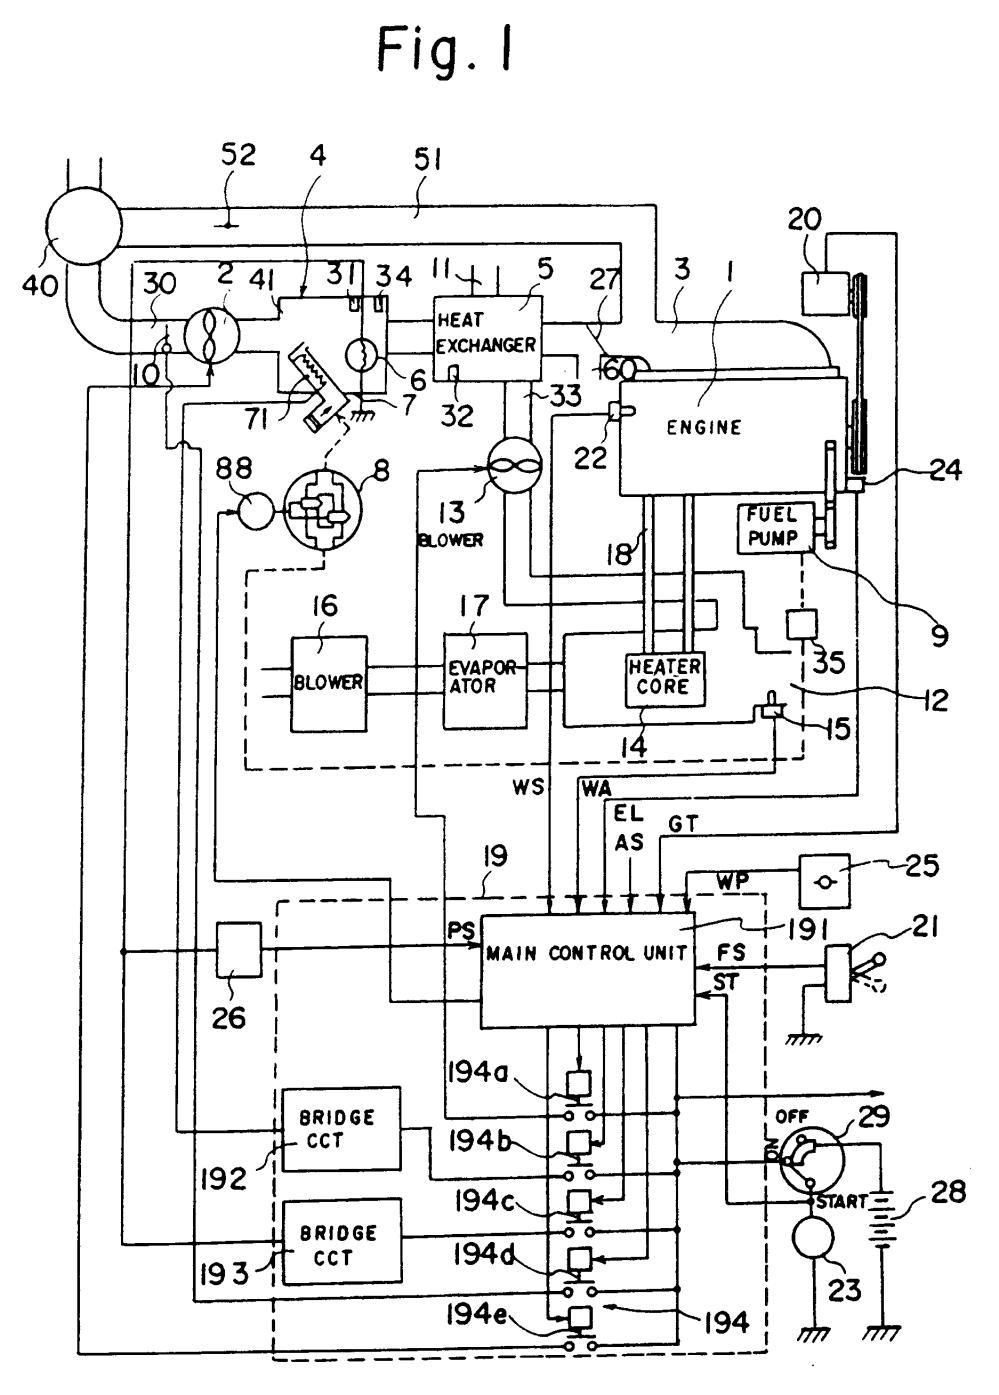 medium resolution of webasto heater wiring diagram data wiring diagramwebasto heater wiring diagram wiring library webasto engine heater wiring